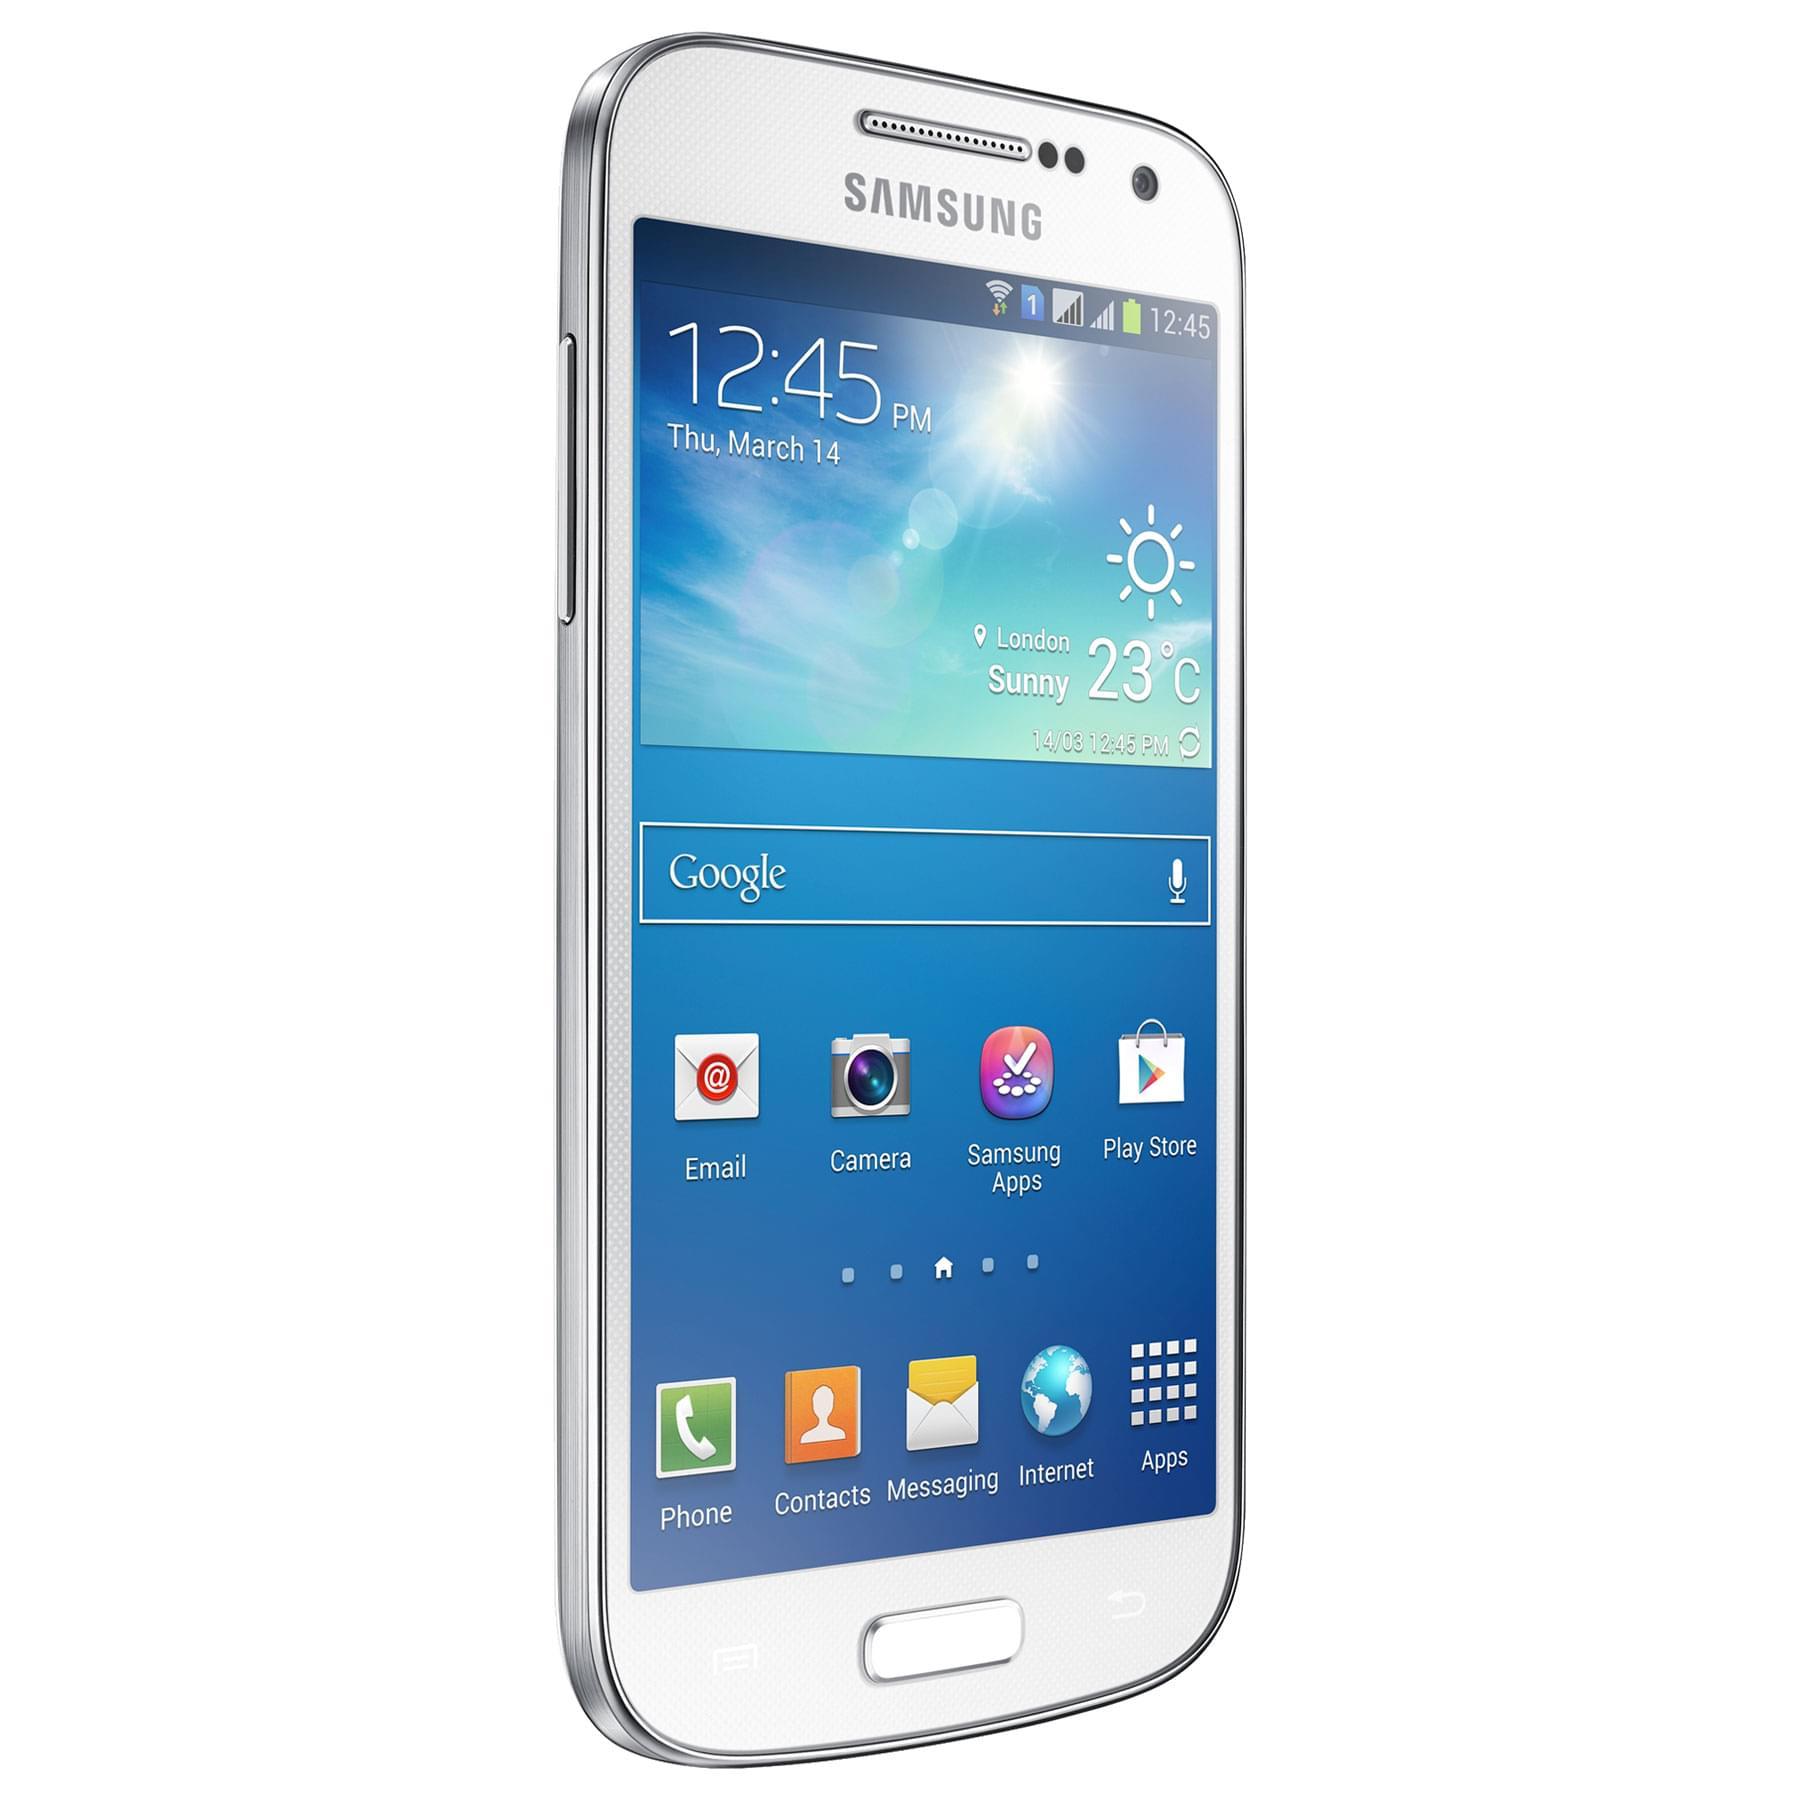 Samsung Galaxy S4 Mini Dual SIM Blanc i9192 (GT-I9192) - Achat / Vente Téléphonie sur Cybertek.fr - 0